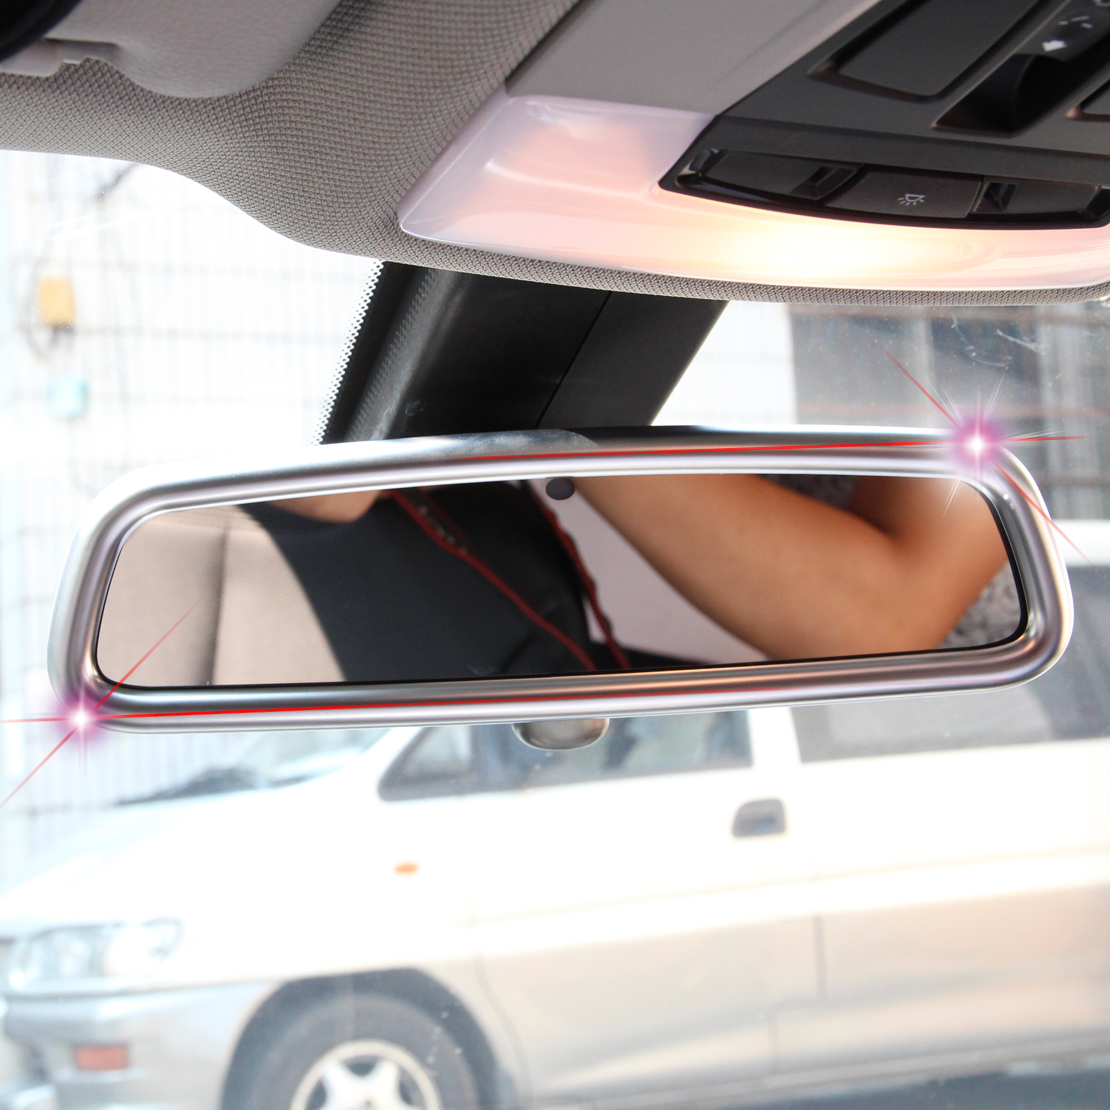 New Matt Chrome Interior Rear View Mirror Trim For Bmw X1 X3 X5 X6 E84 F25 E71 Ebay